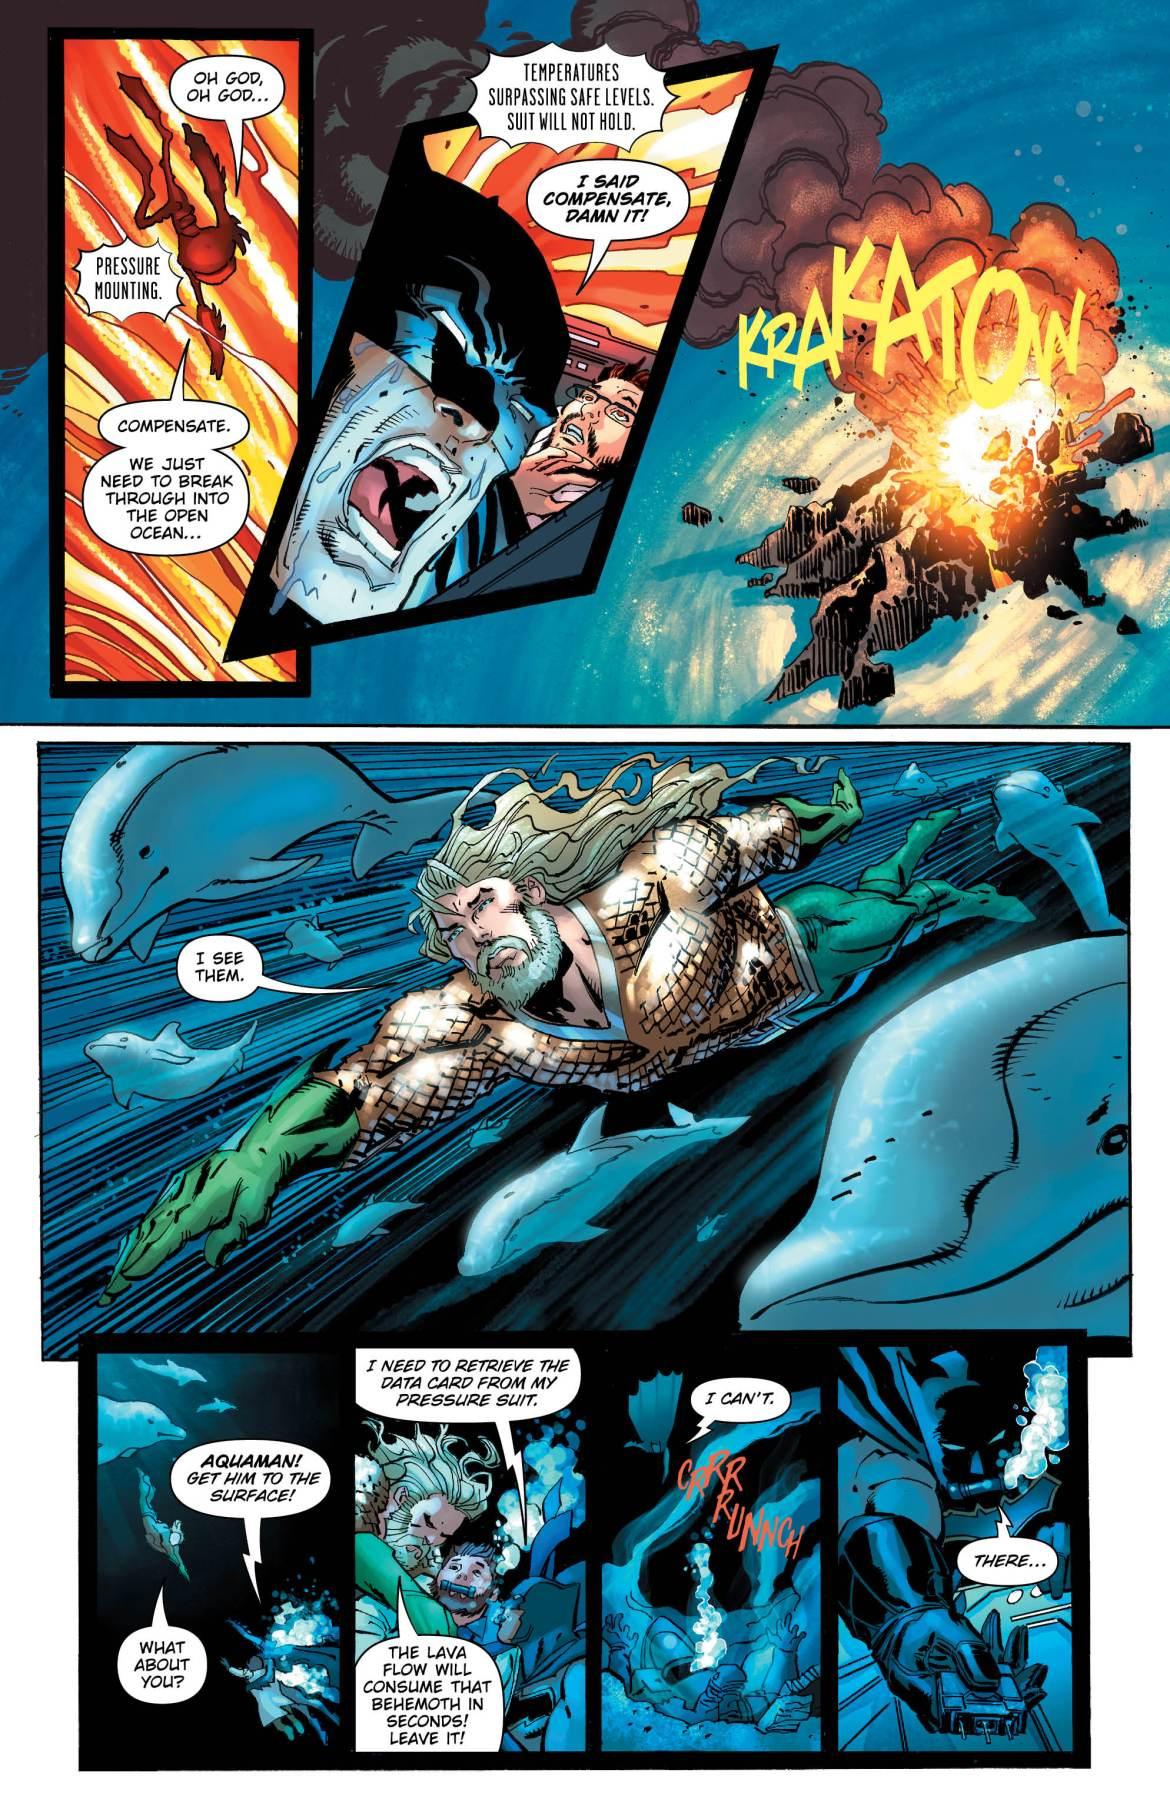 Dark Days The Forge 5 -DC Comics News